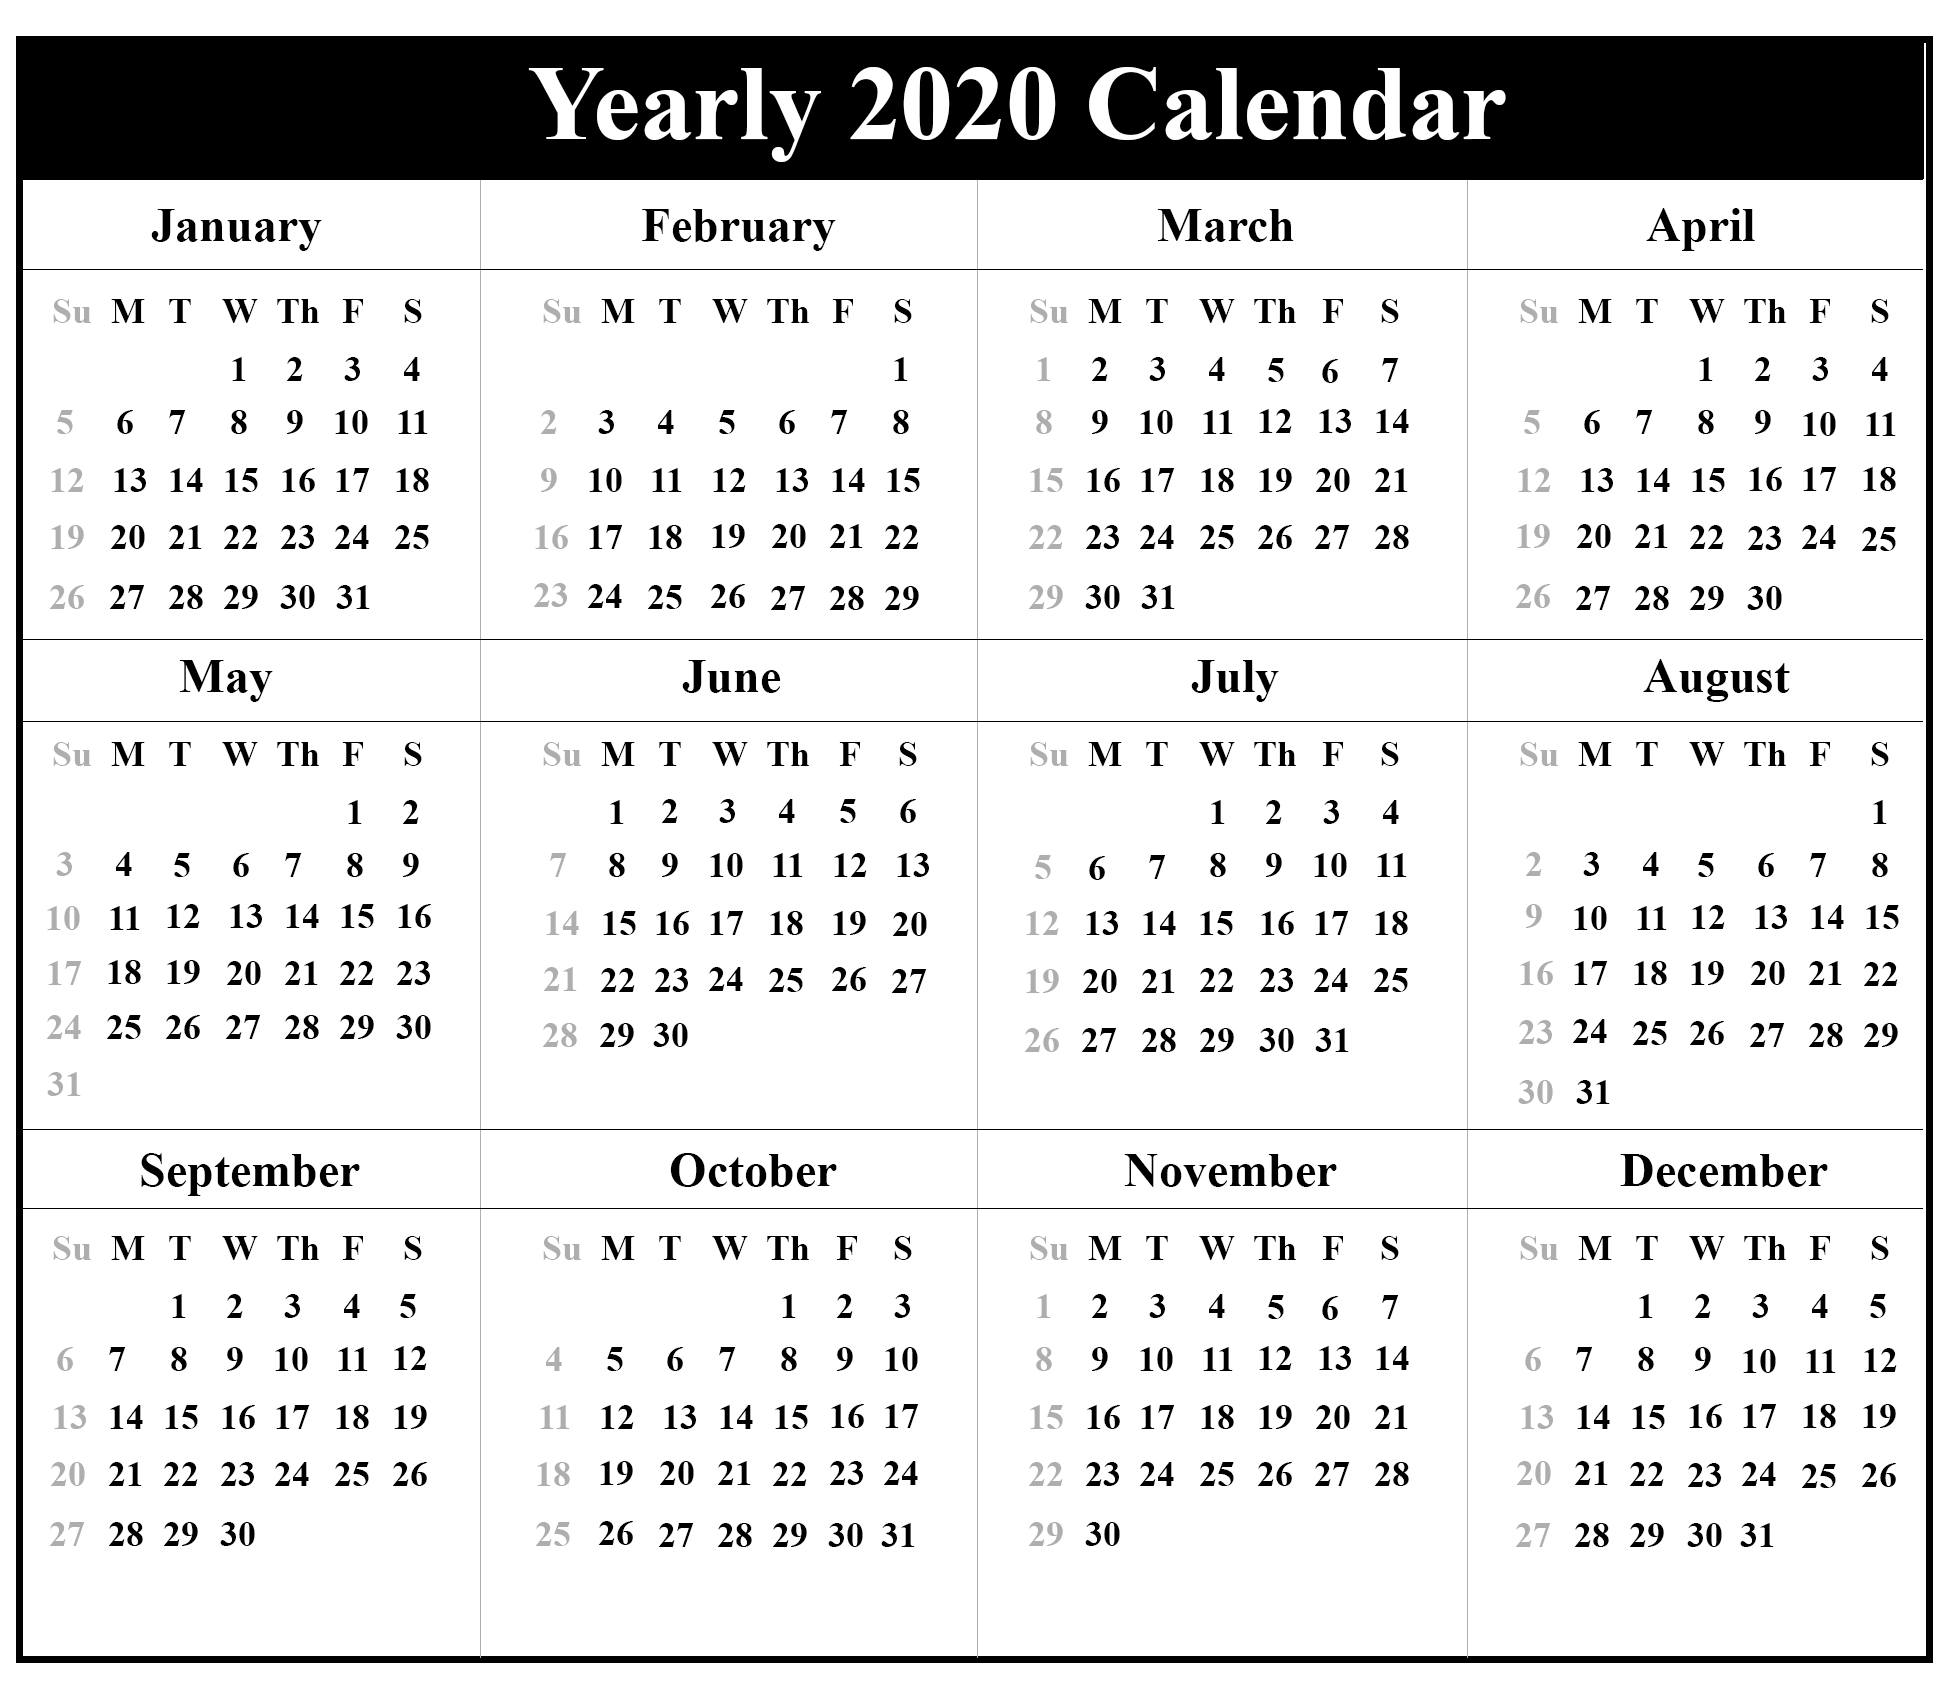 Printable Yearly Calendar 2020 Template With Holidays [Pdf-January 2020 Urdu Calendar